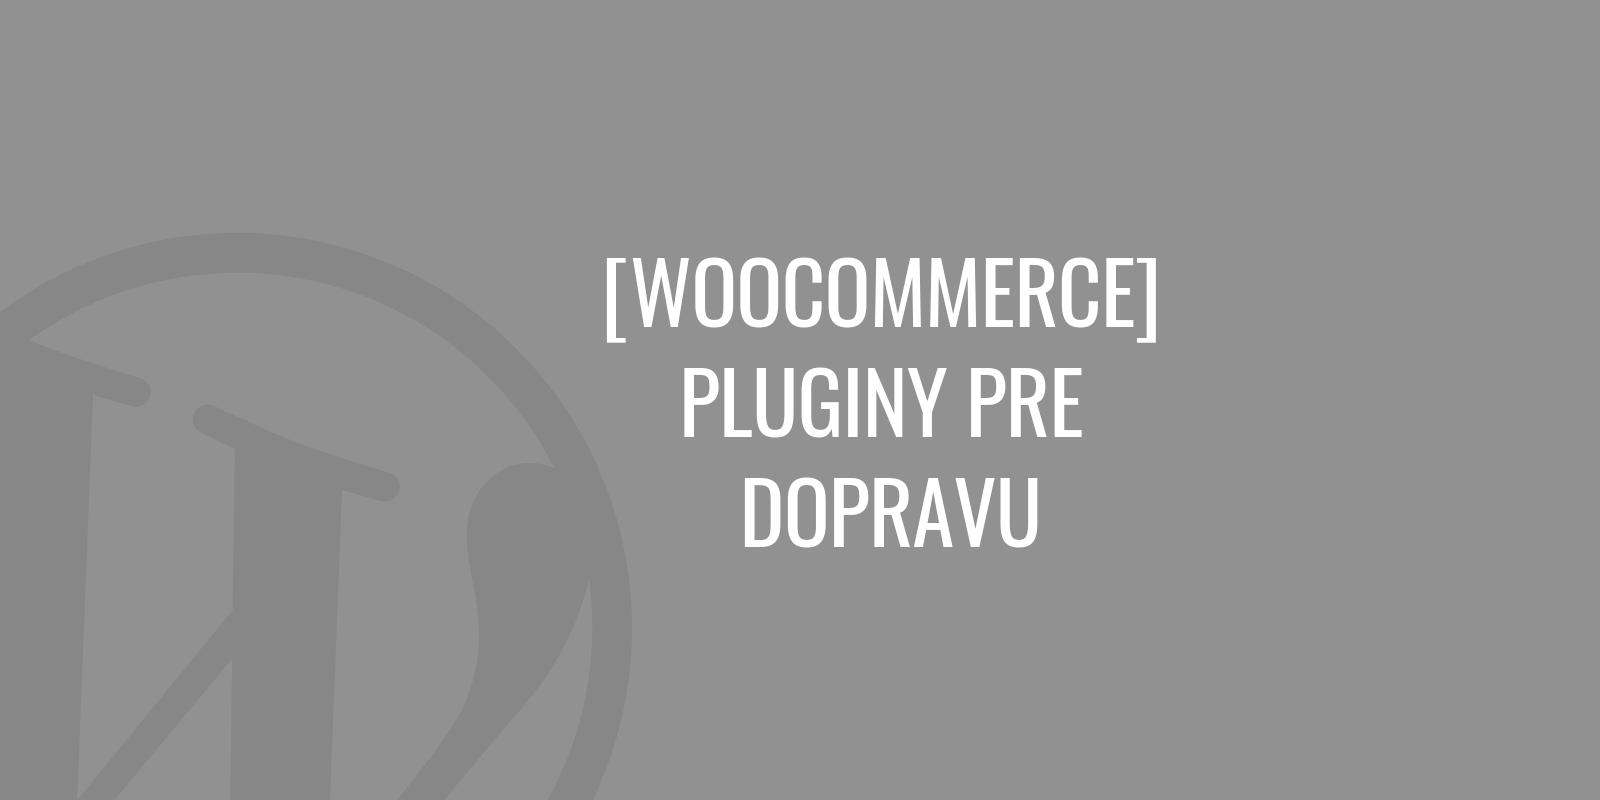 WooCommerce pluginy pre dopravu